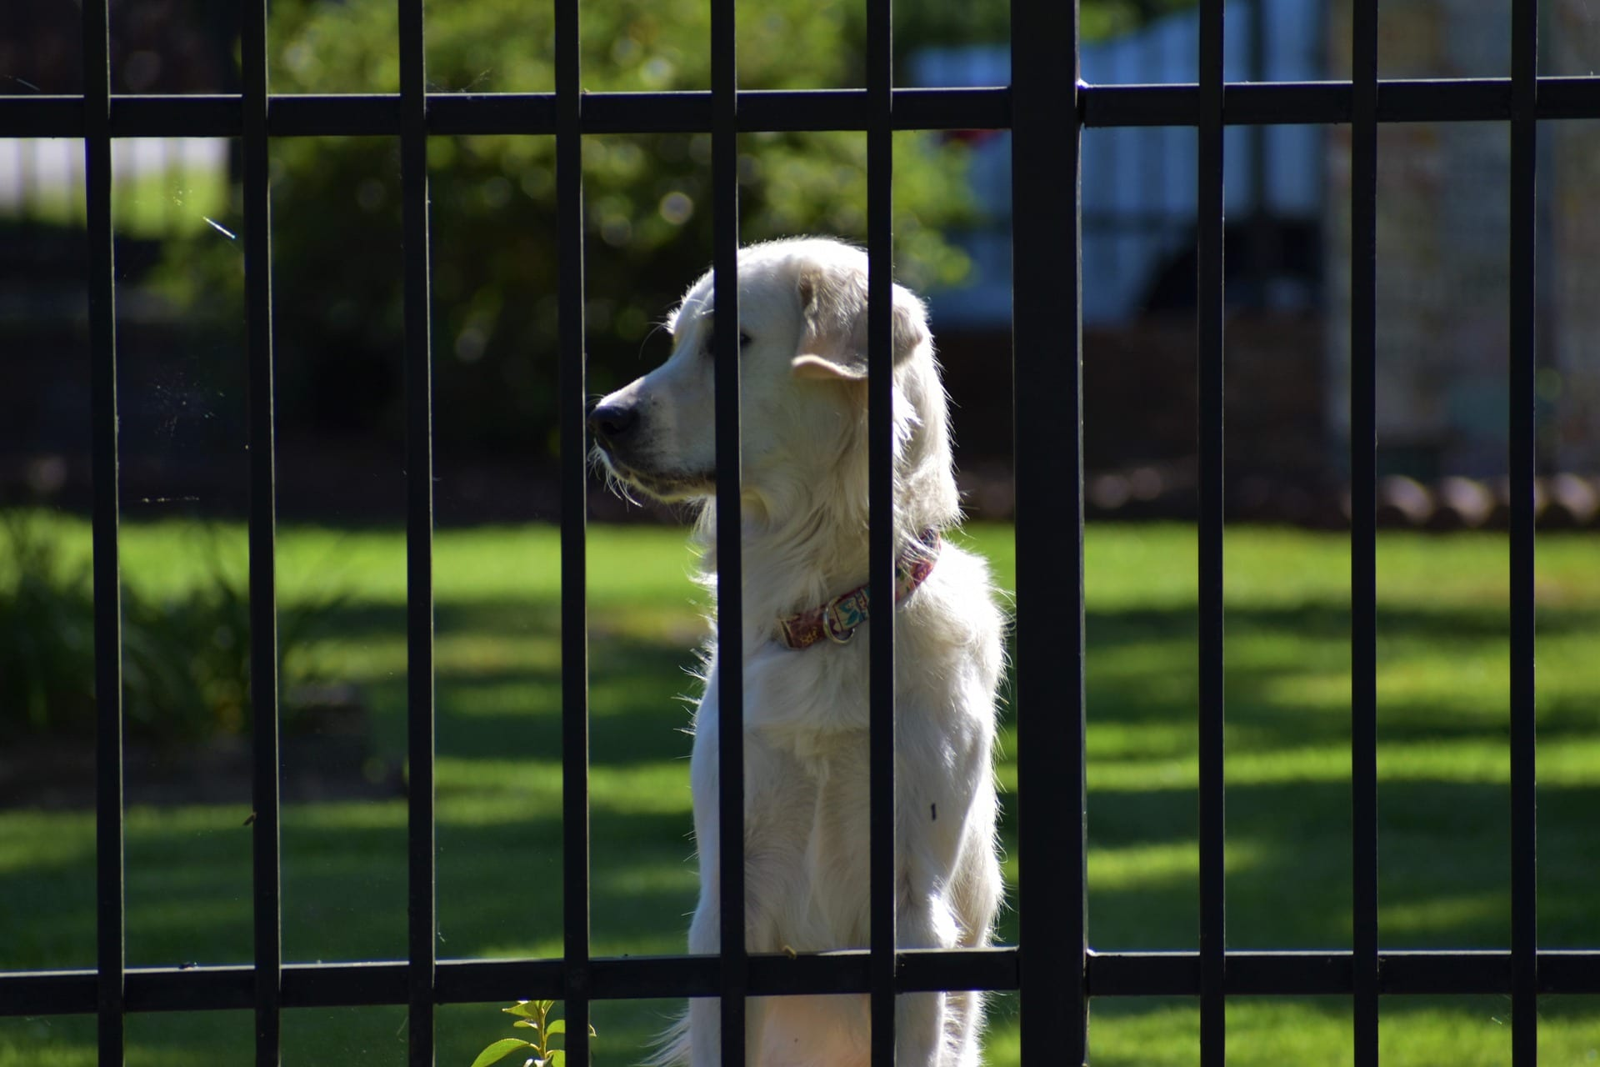 chien dans une jardin